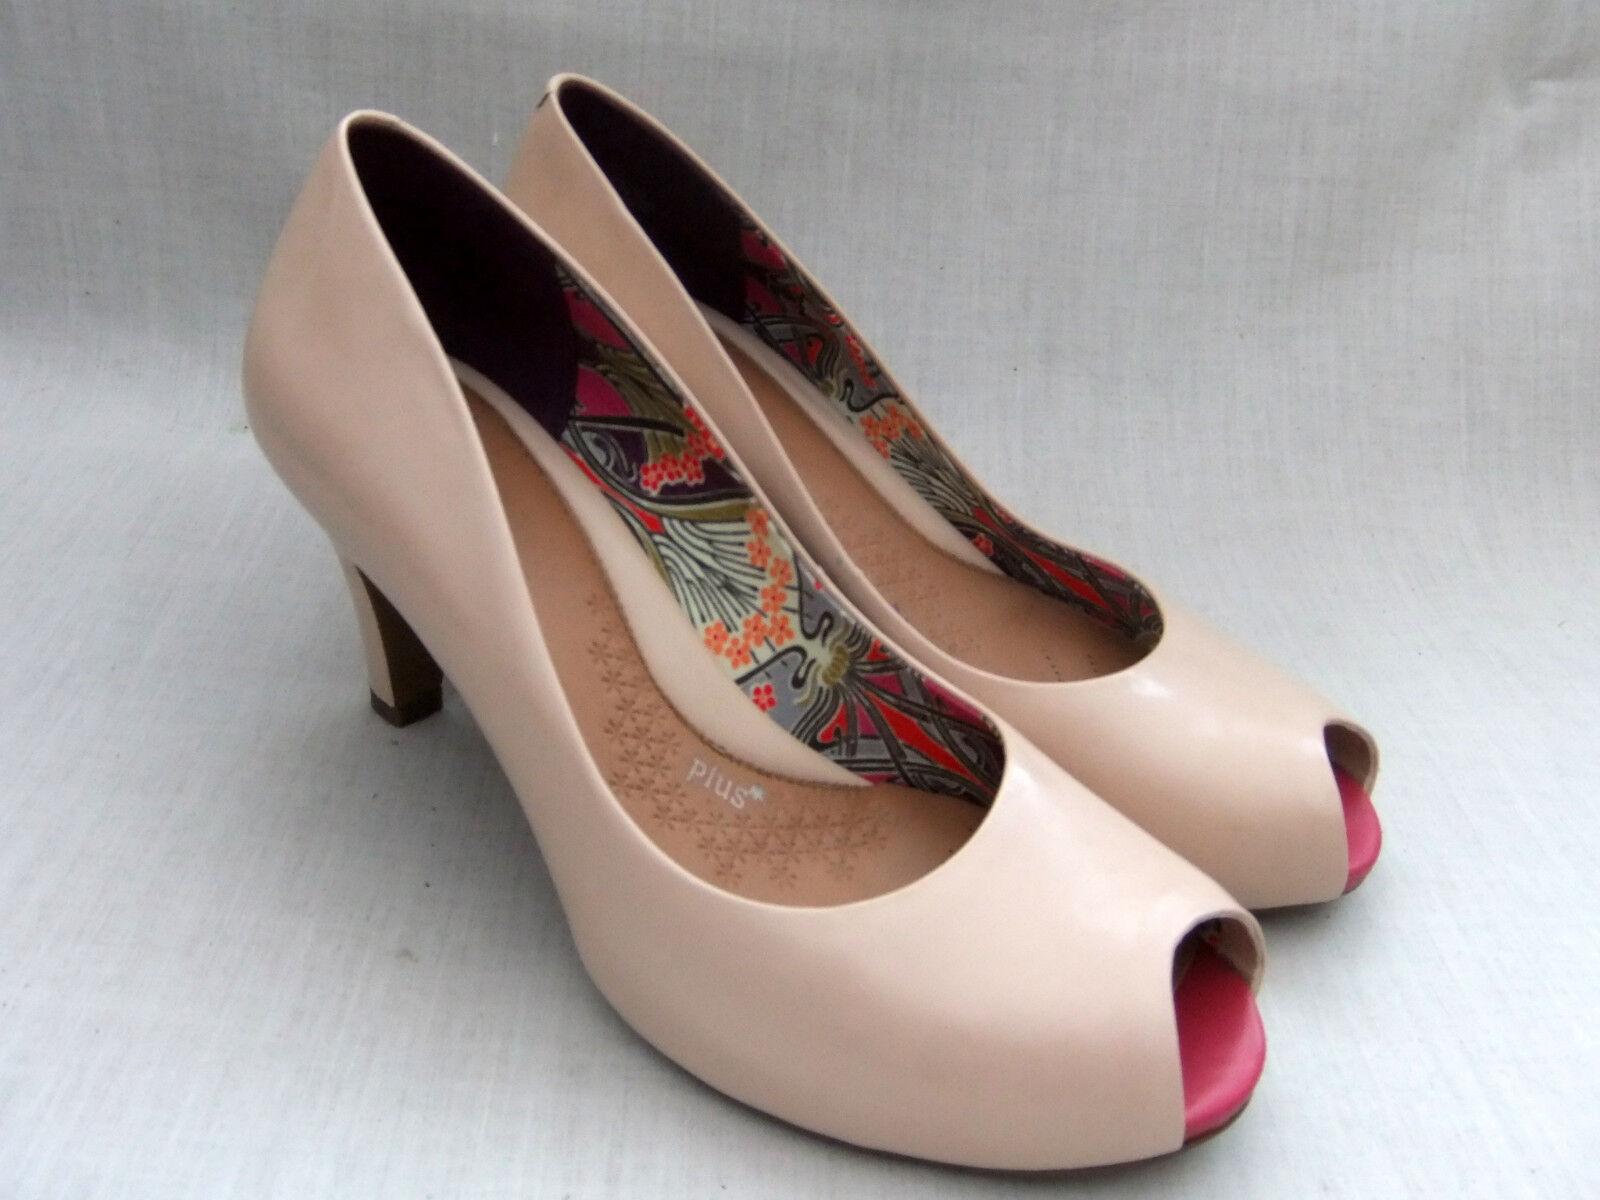 NEW CLARKS CHORUS SING Damenschuhe NUDE PATENT LEATHER PEEP-TOE 41 Schuhe SIZE 7 / 41 PEEP-TOE f68519